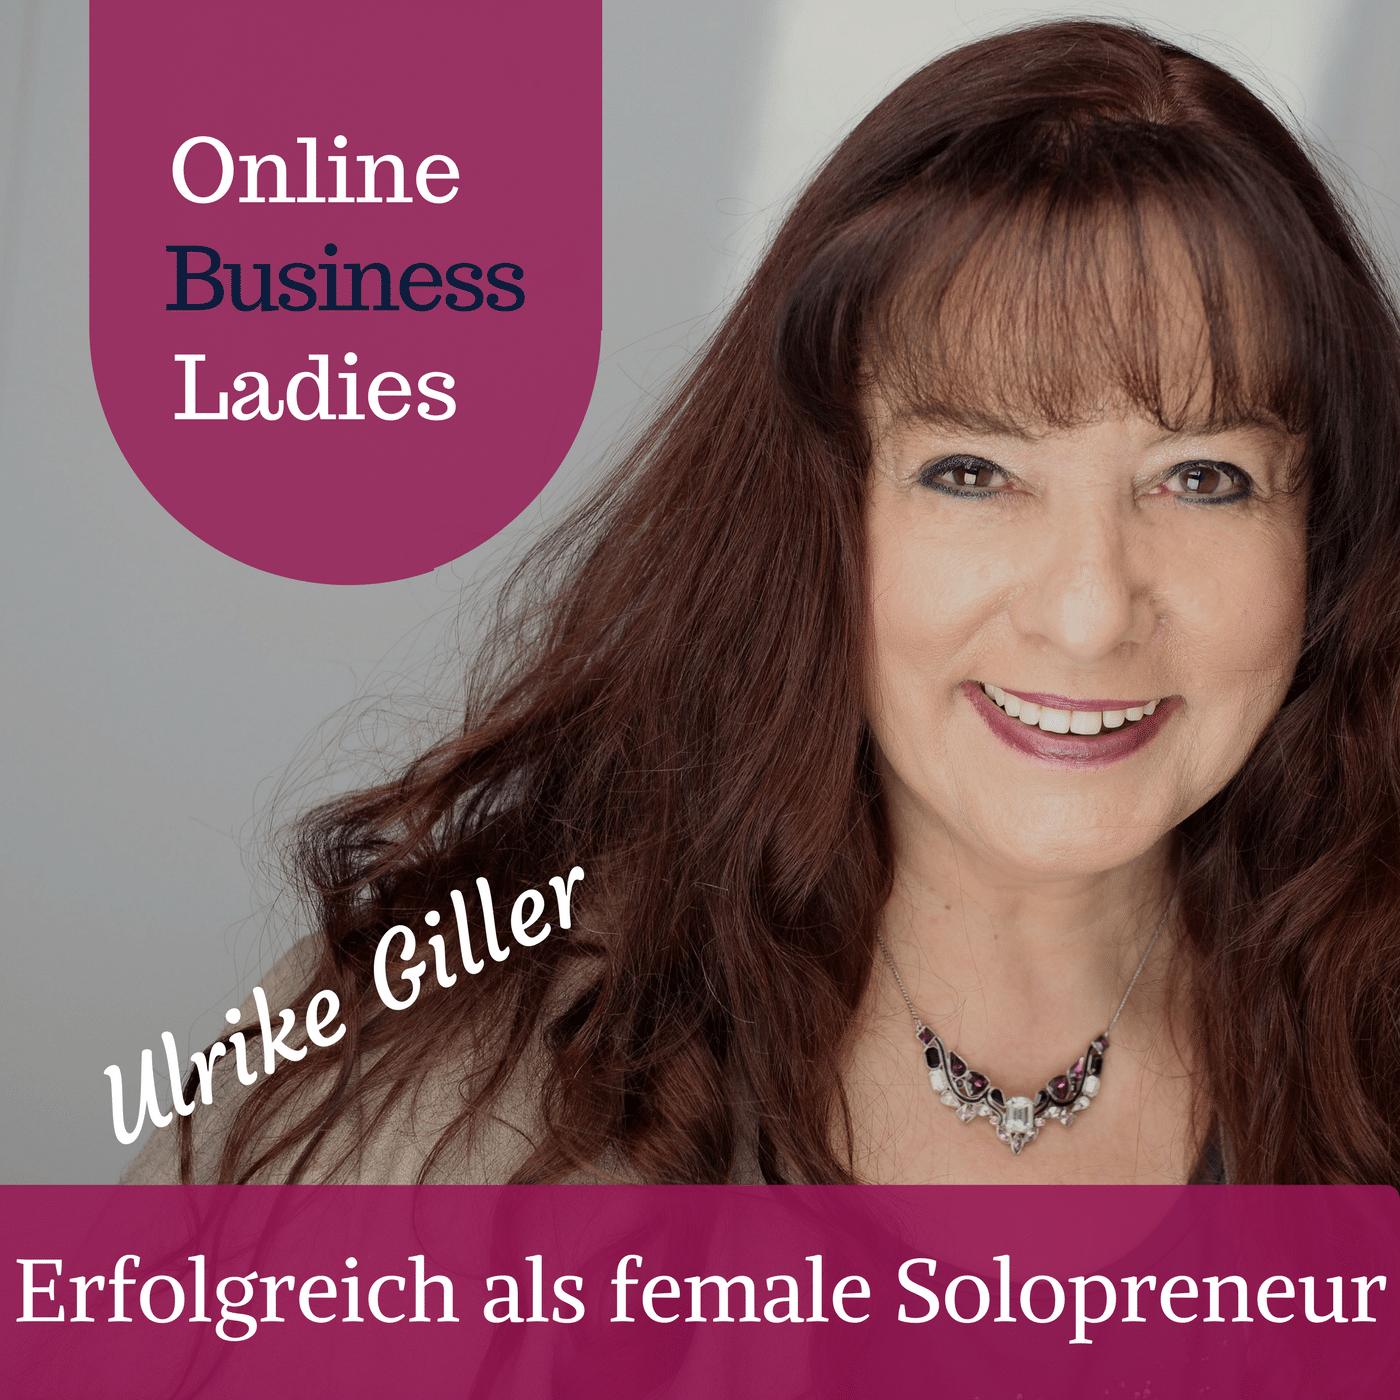 Der OnlineBusinessLadies Podcast by Ulrike Giller